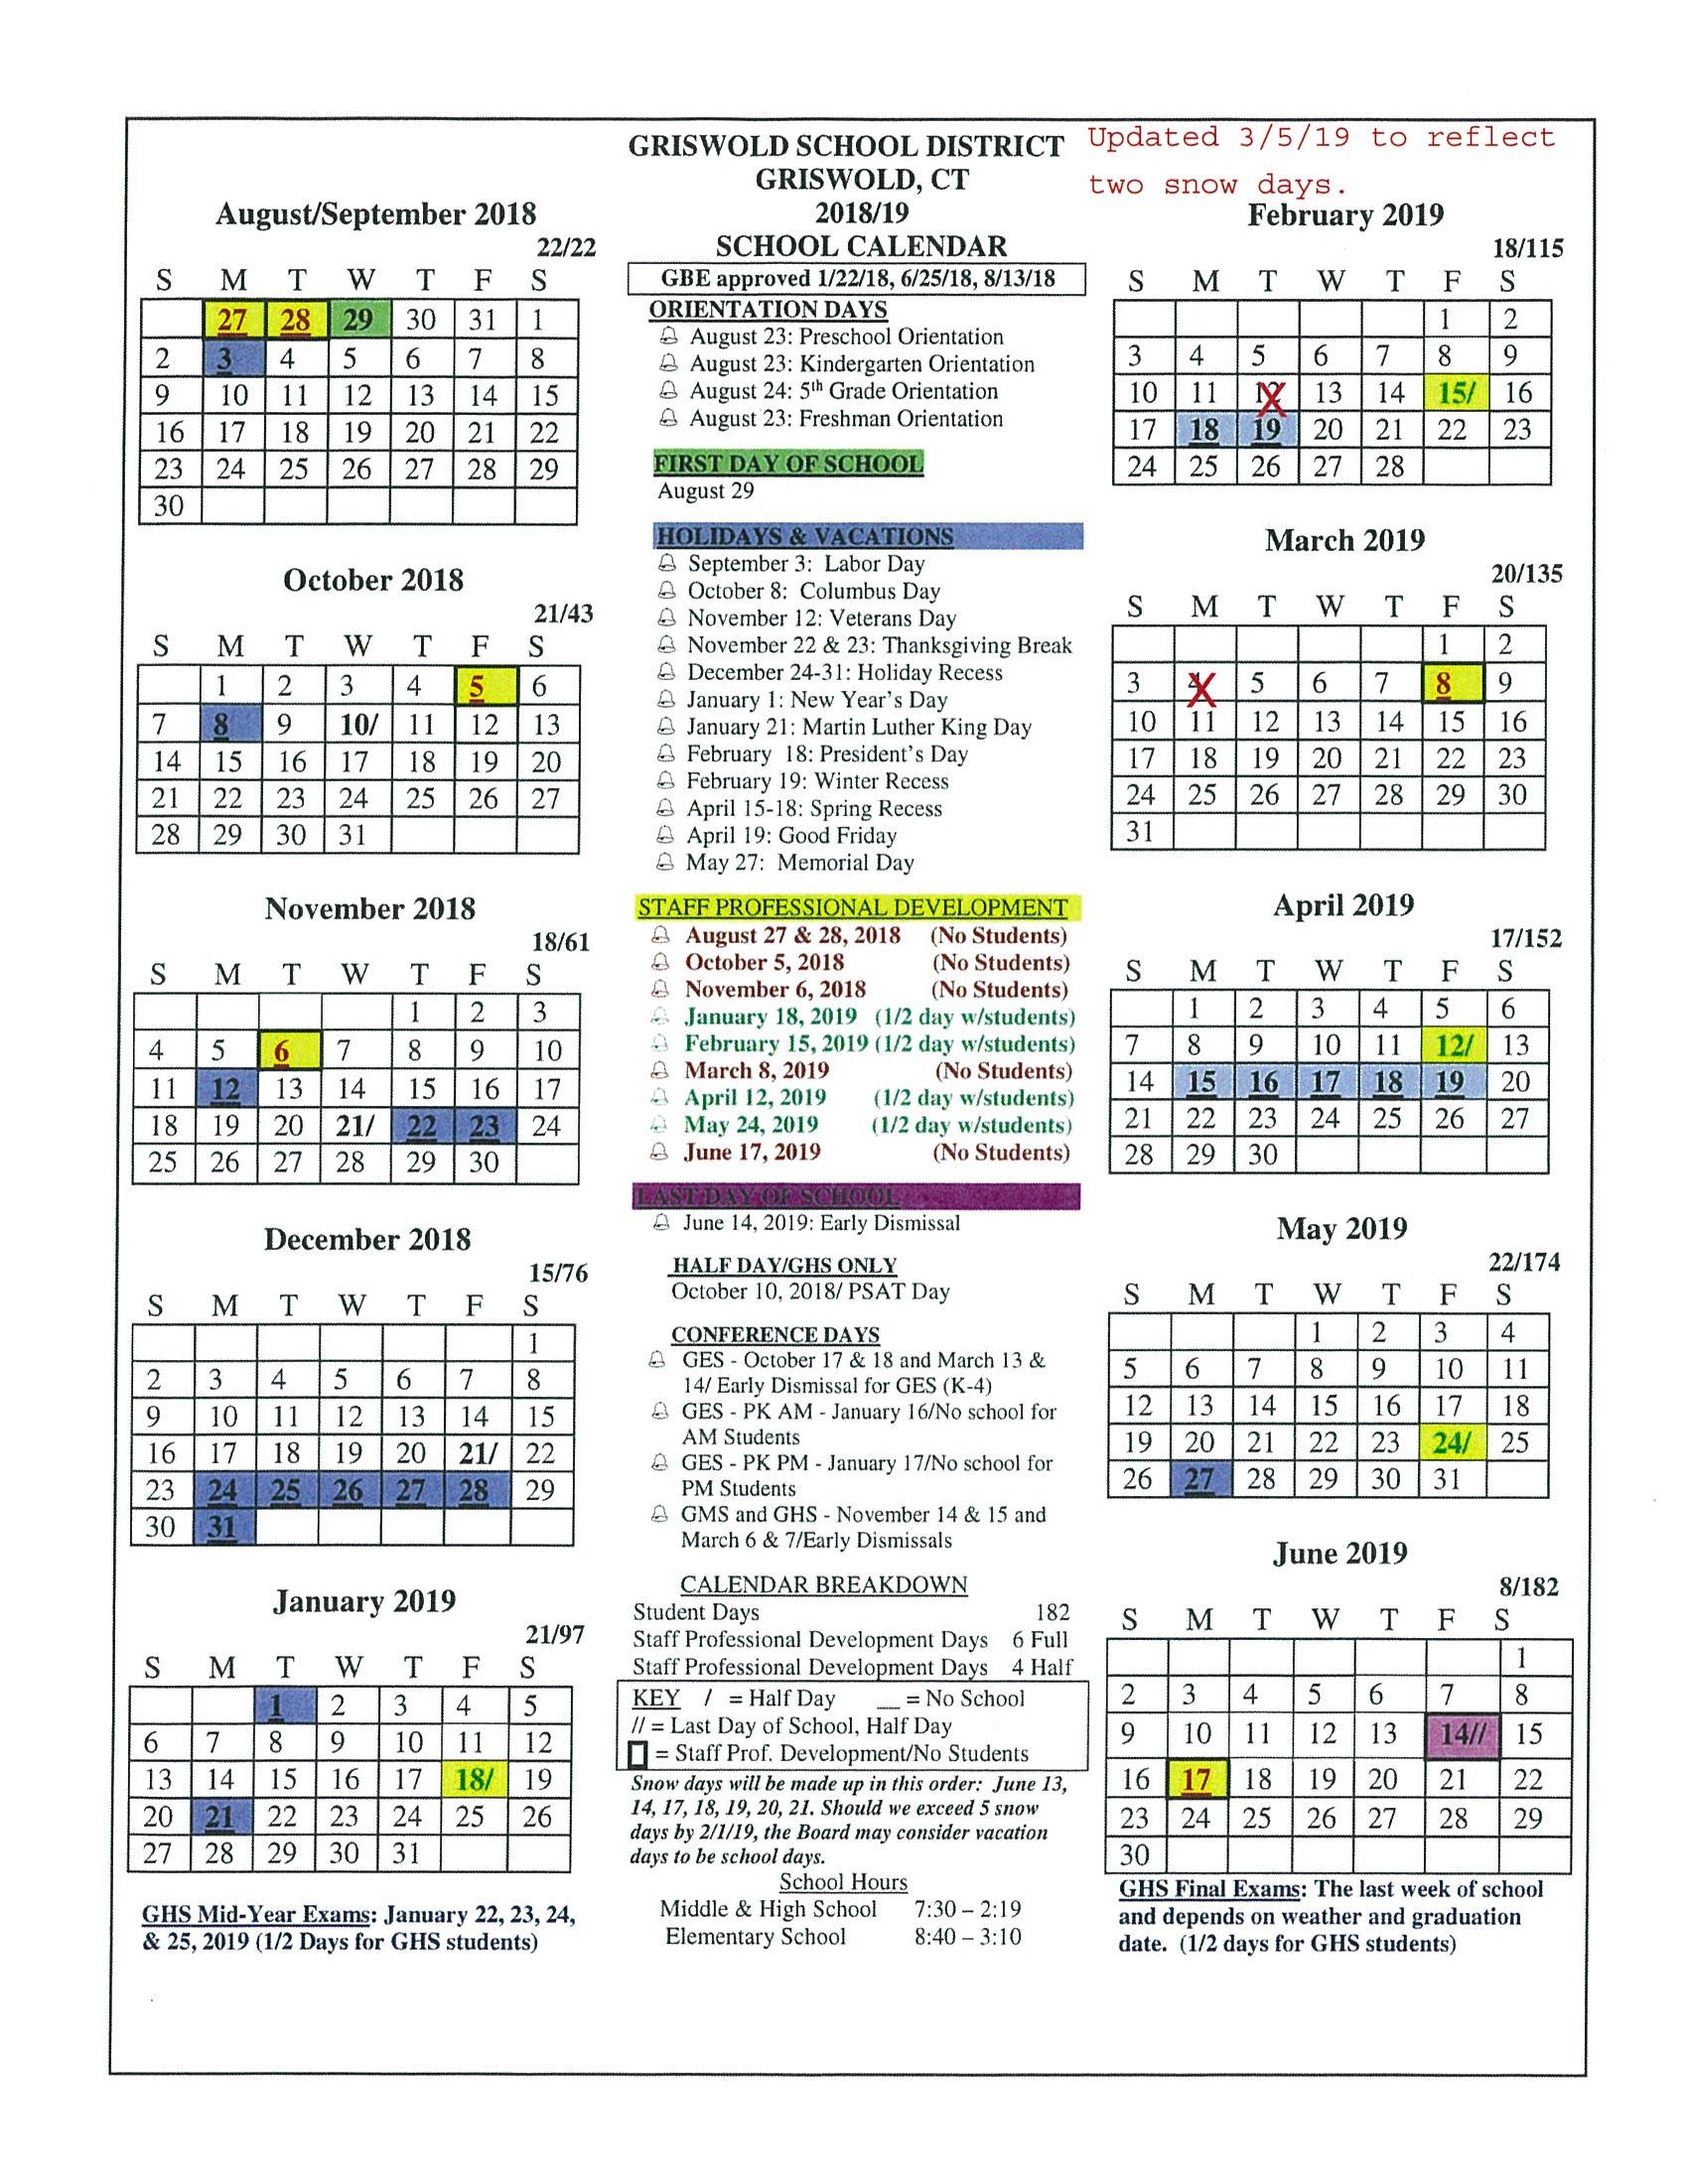 University Of Iowa Calendar 2020 Board Approved Academic Calendar   Griswold Public Schools